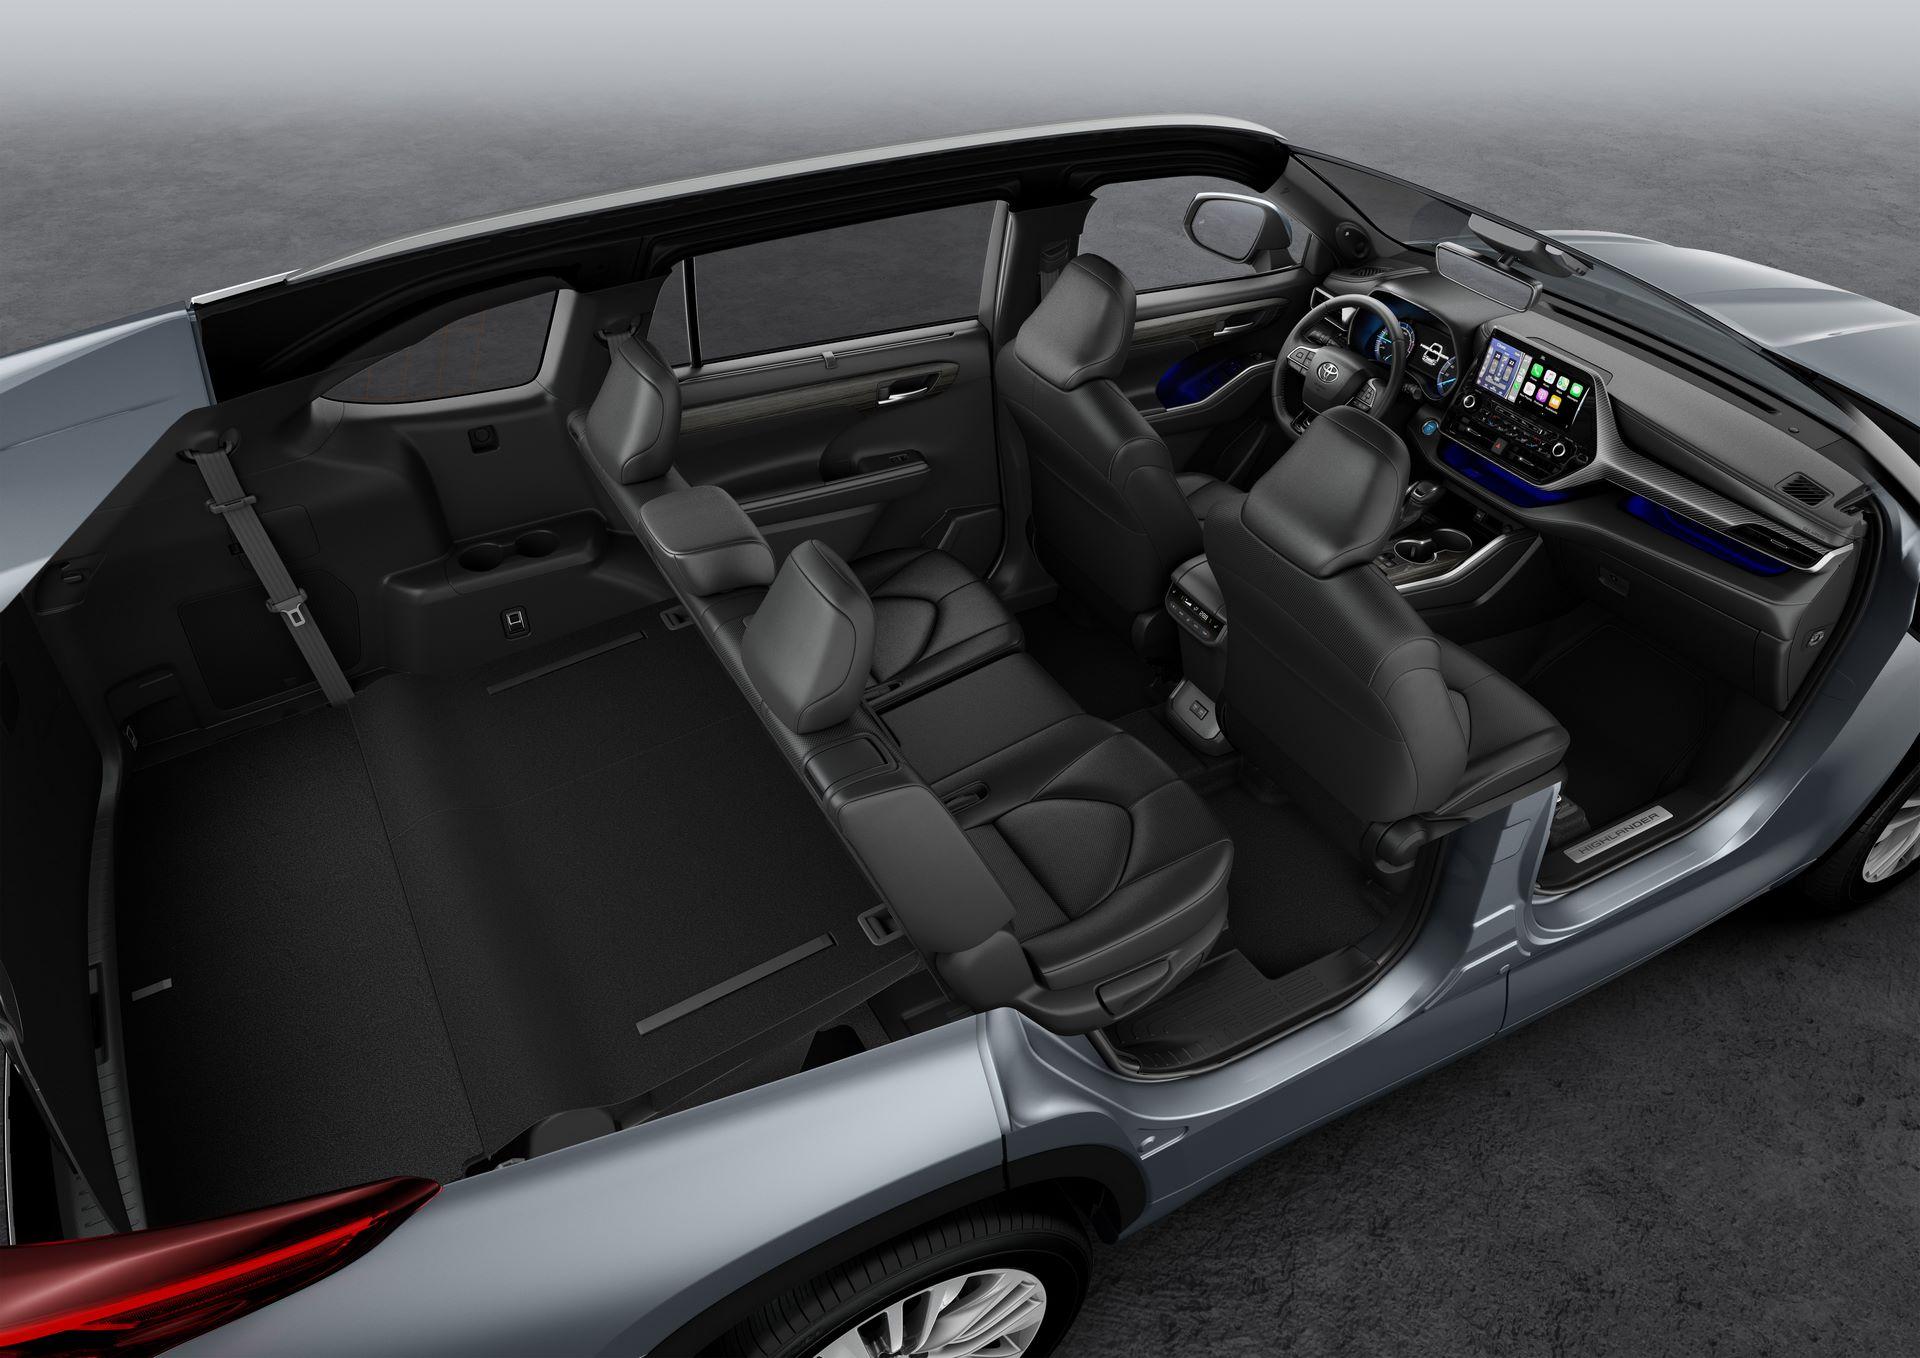 Toyota-Highlander-Europe-2021-5